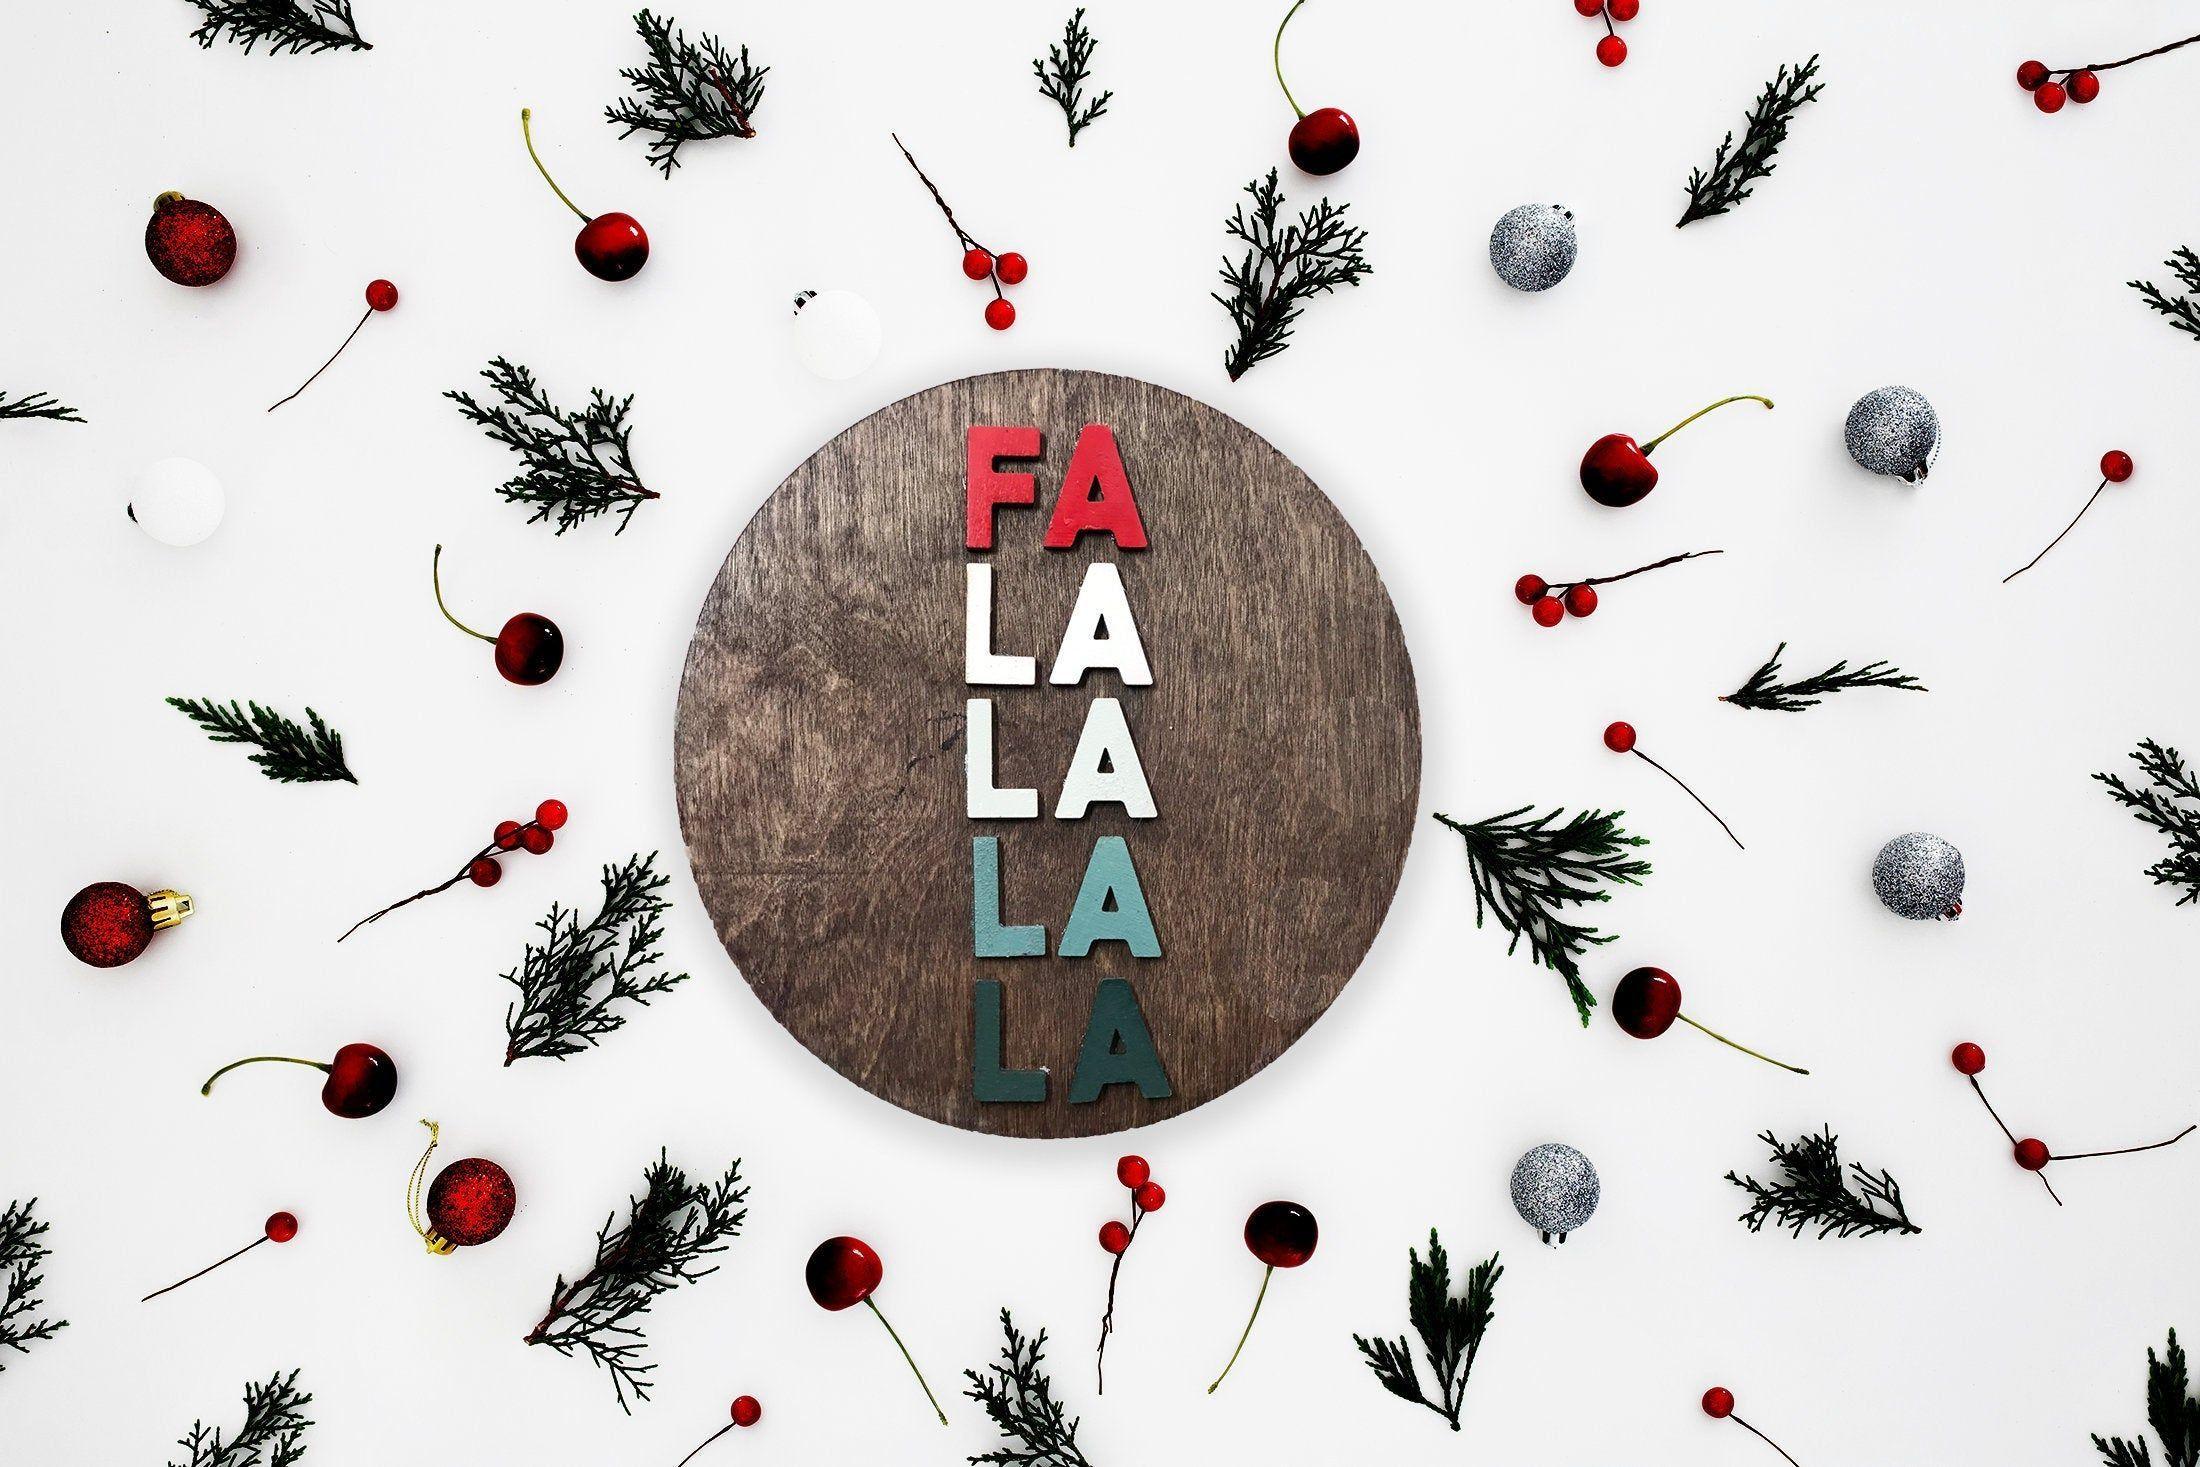 Fa La La La La Wood Circle Sign Christmas Carol Lyrics Round Sign For Home Hanging Or Standing Birch Wood Signs Colorful Falalalala